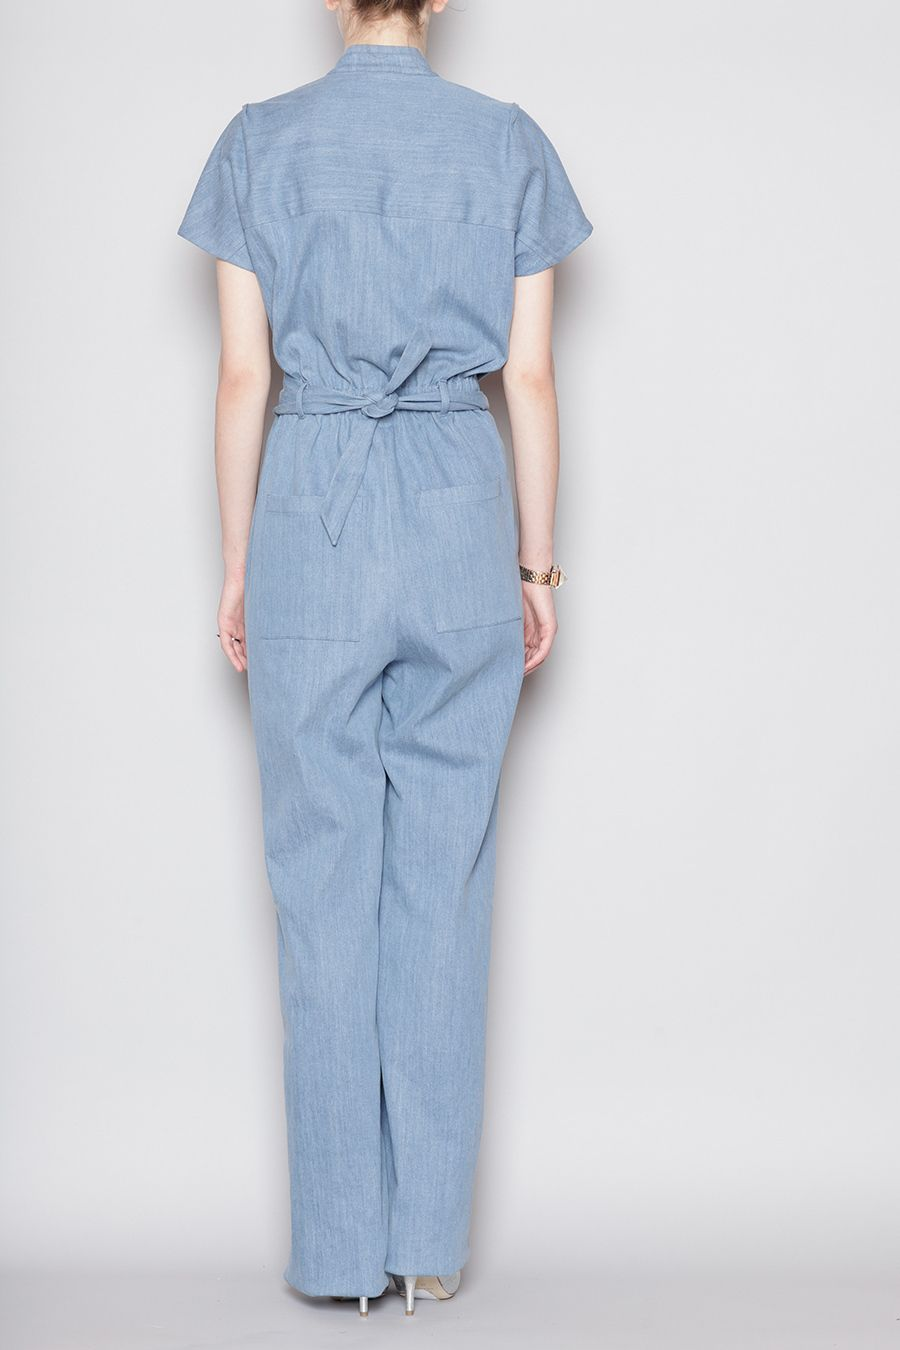 Short sleeve jumpsuit in a mediumweight denim fabric round neck